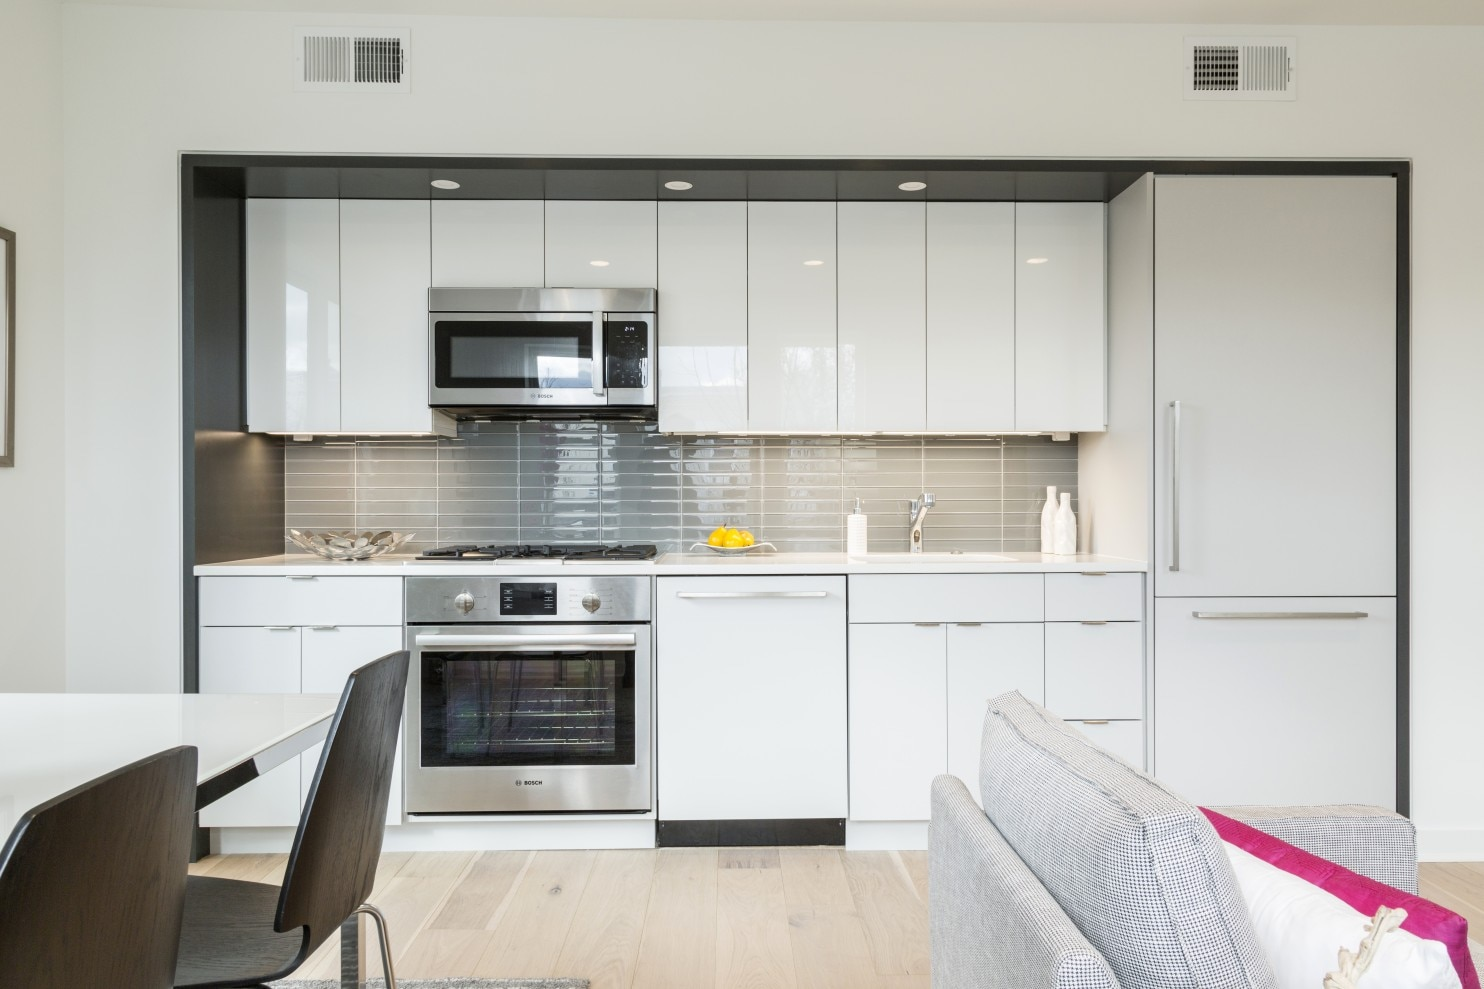 Beale House Kitchen — Benjamin C Tankersley/For The Washington Post